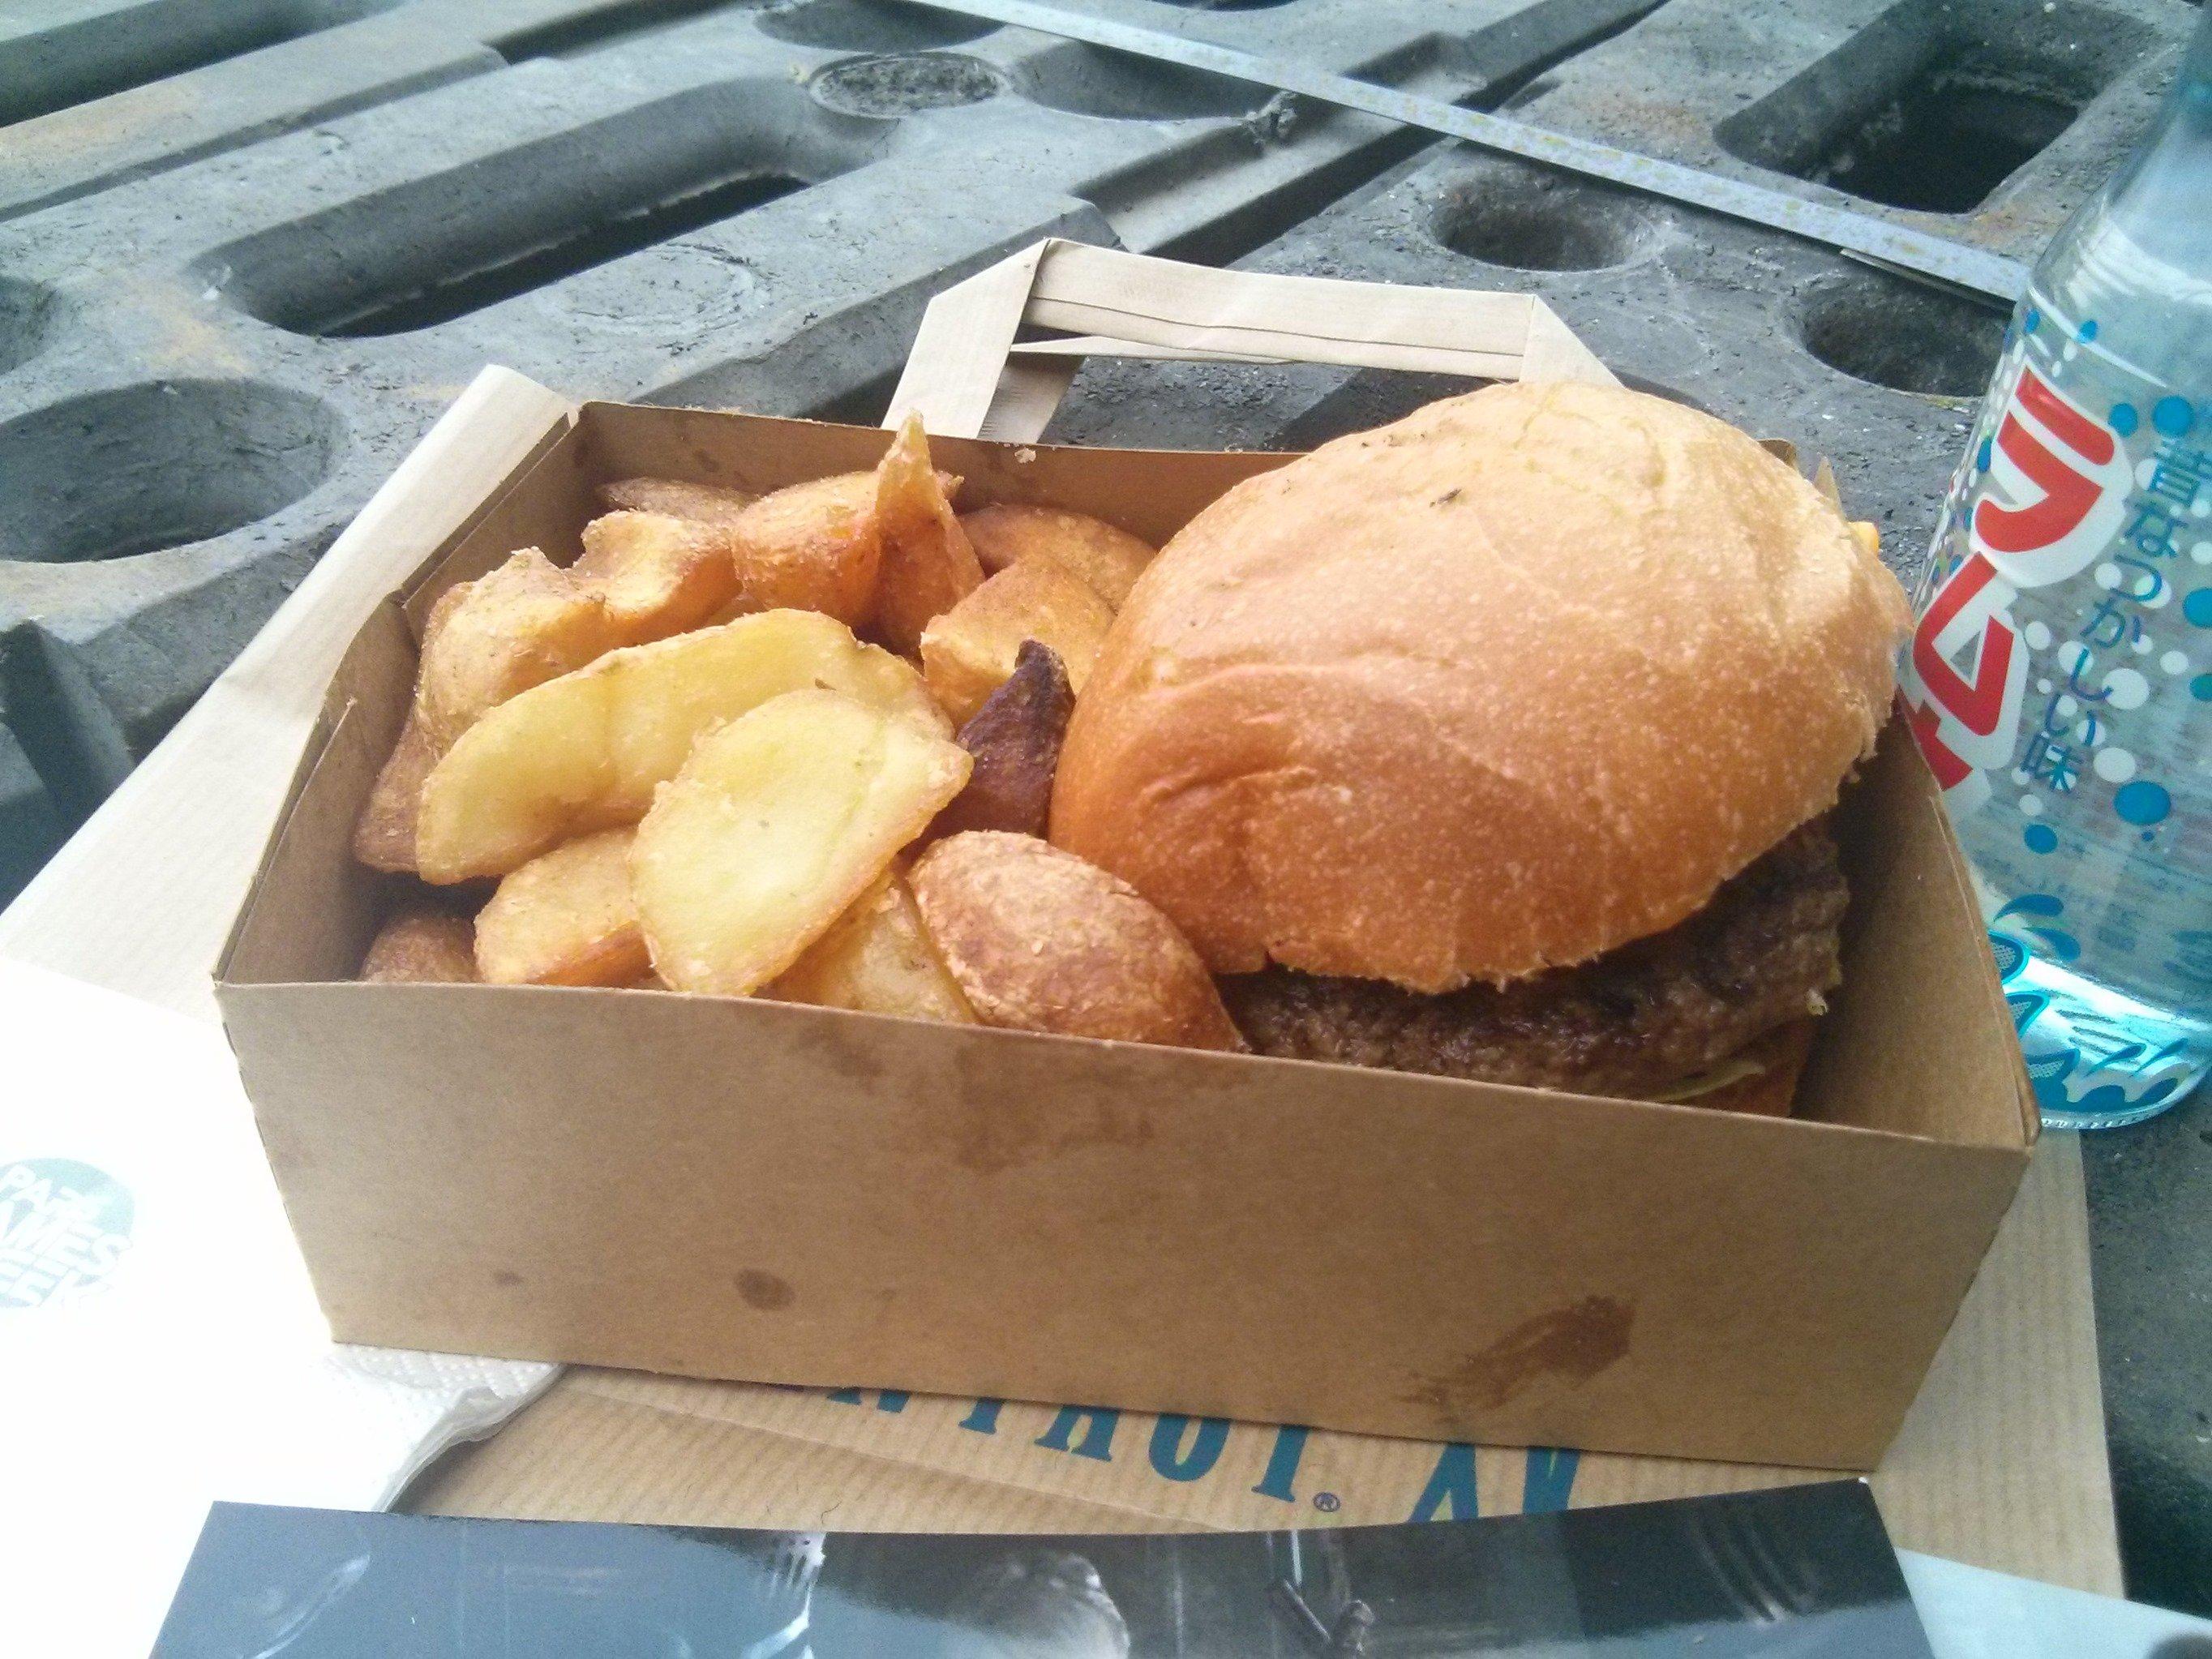 Final Fantasy XV Food Truck Serves Burgers 7